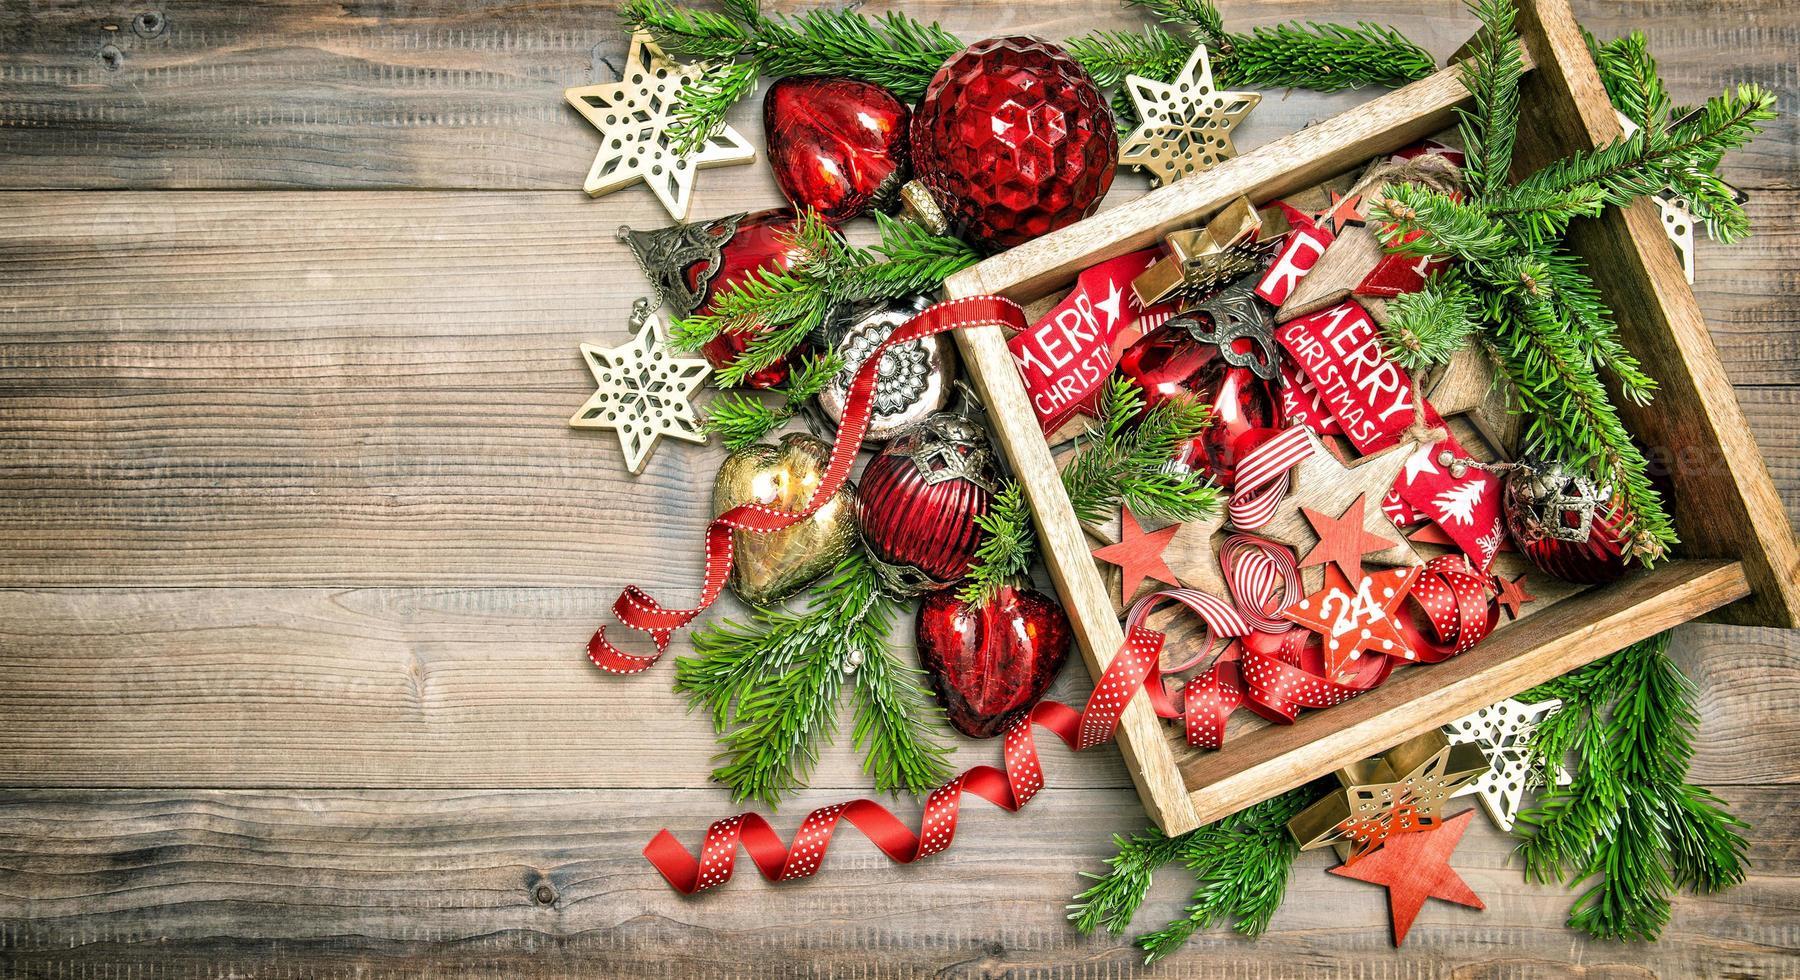 kerstversiering, speelgoed en ornamenten vintage foto